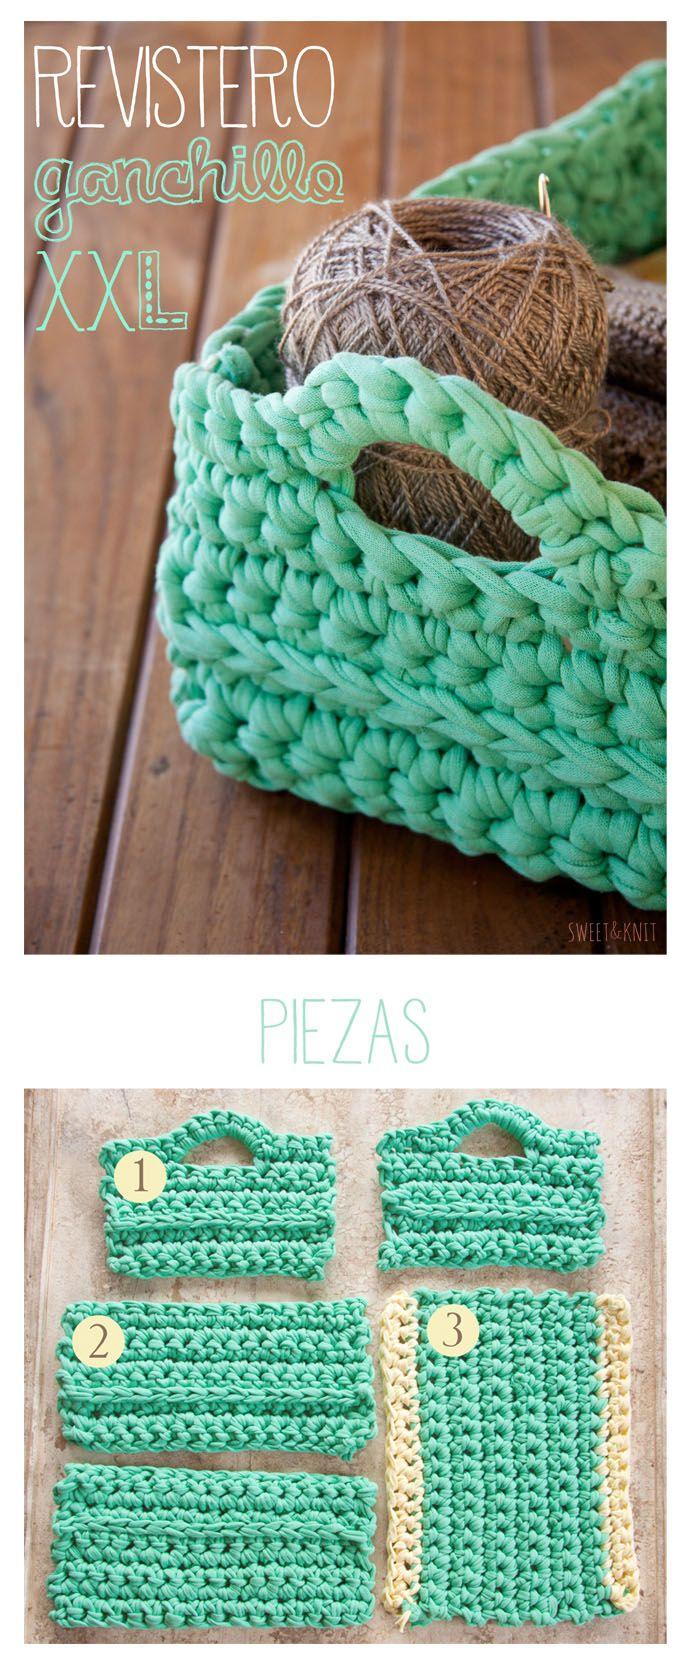 Tutorial Crochet Xxl : Crochet XXL square basket - free pattern (spa) #tshirtyarn #trapillo # ...